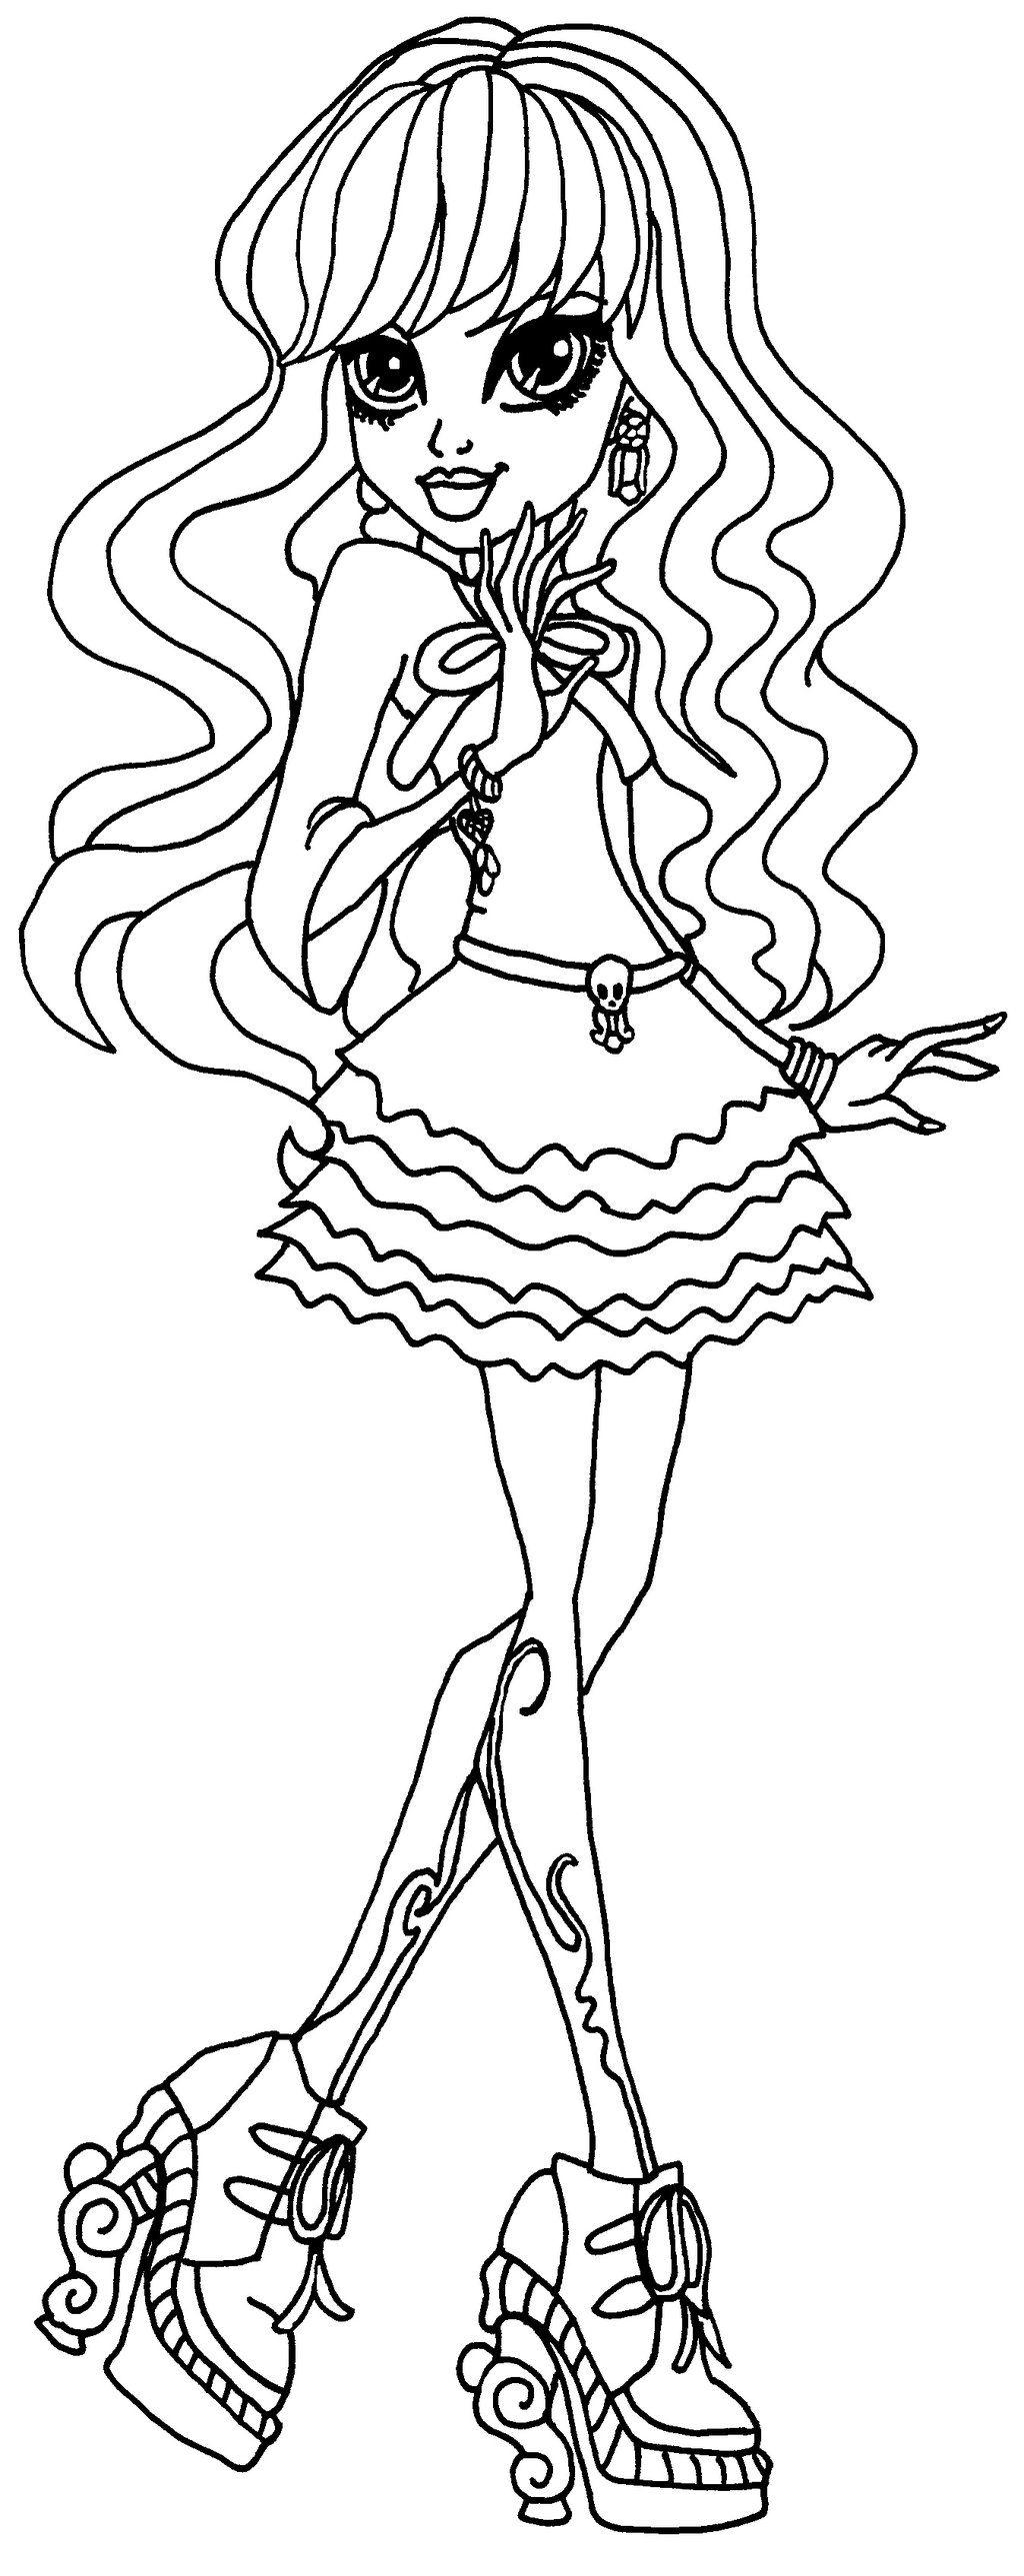 Monster High Ausmalbilder Jinafire : Ausgezeichnet Ausmalbilder Monster High Jinafire Zeitgen Ssisch